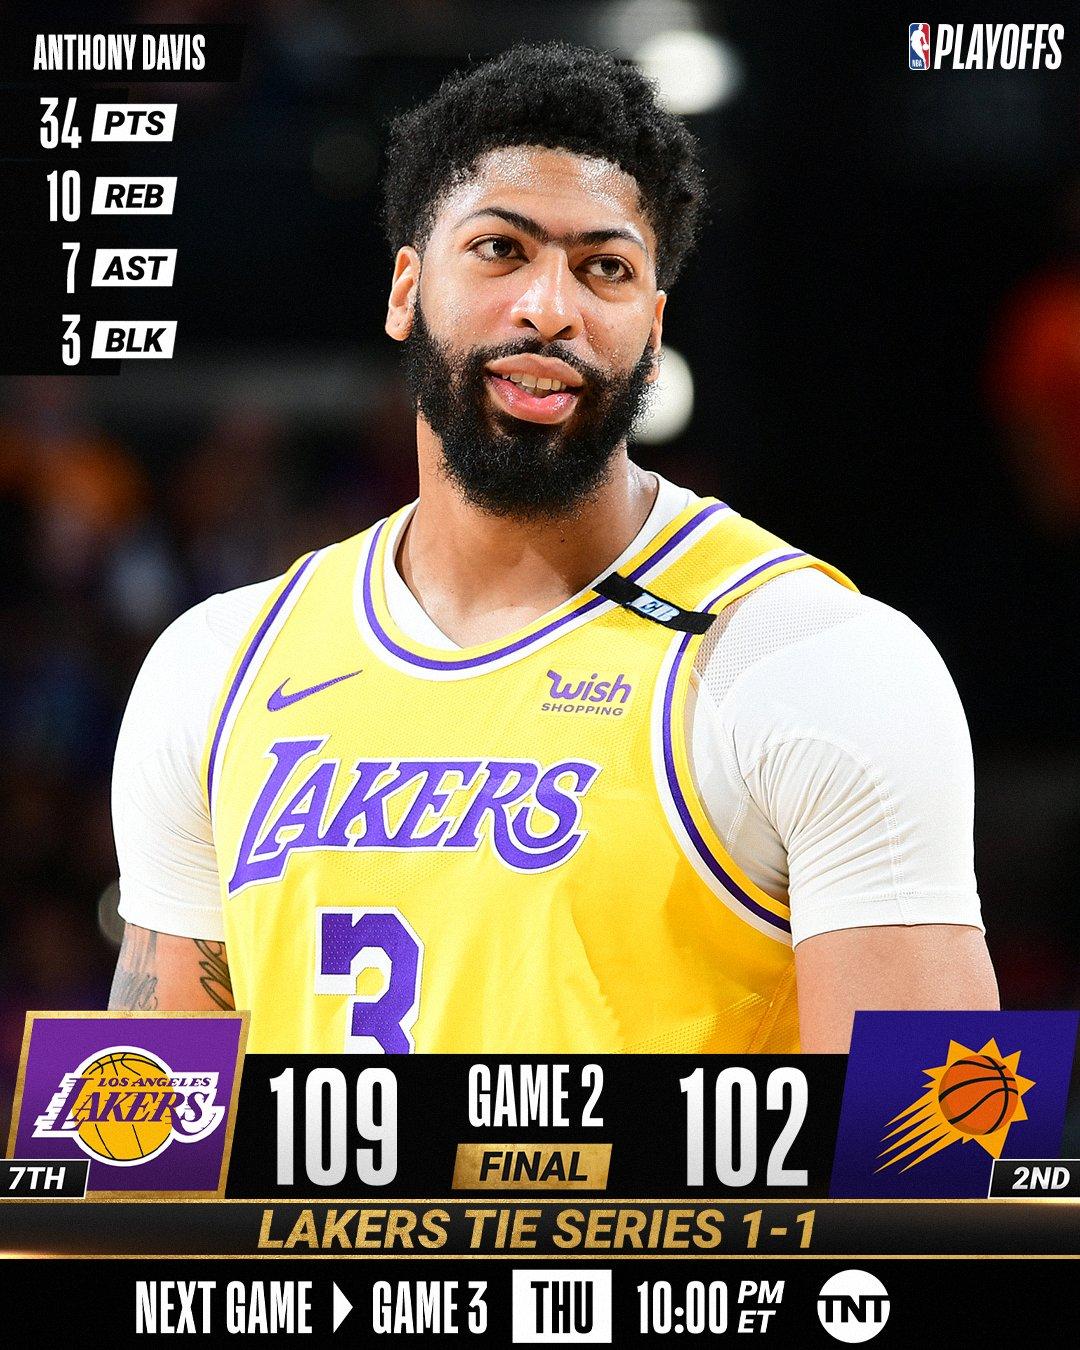 26-5-2